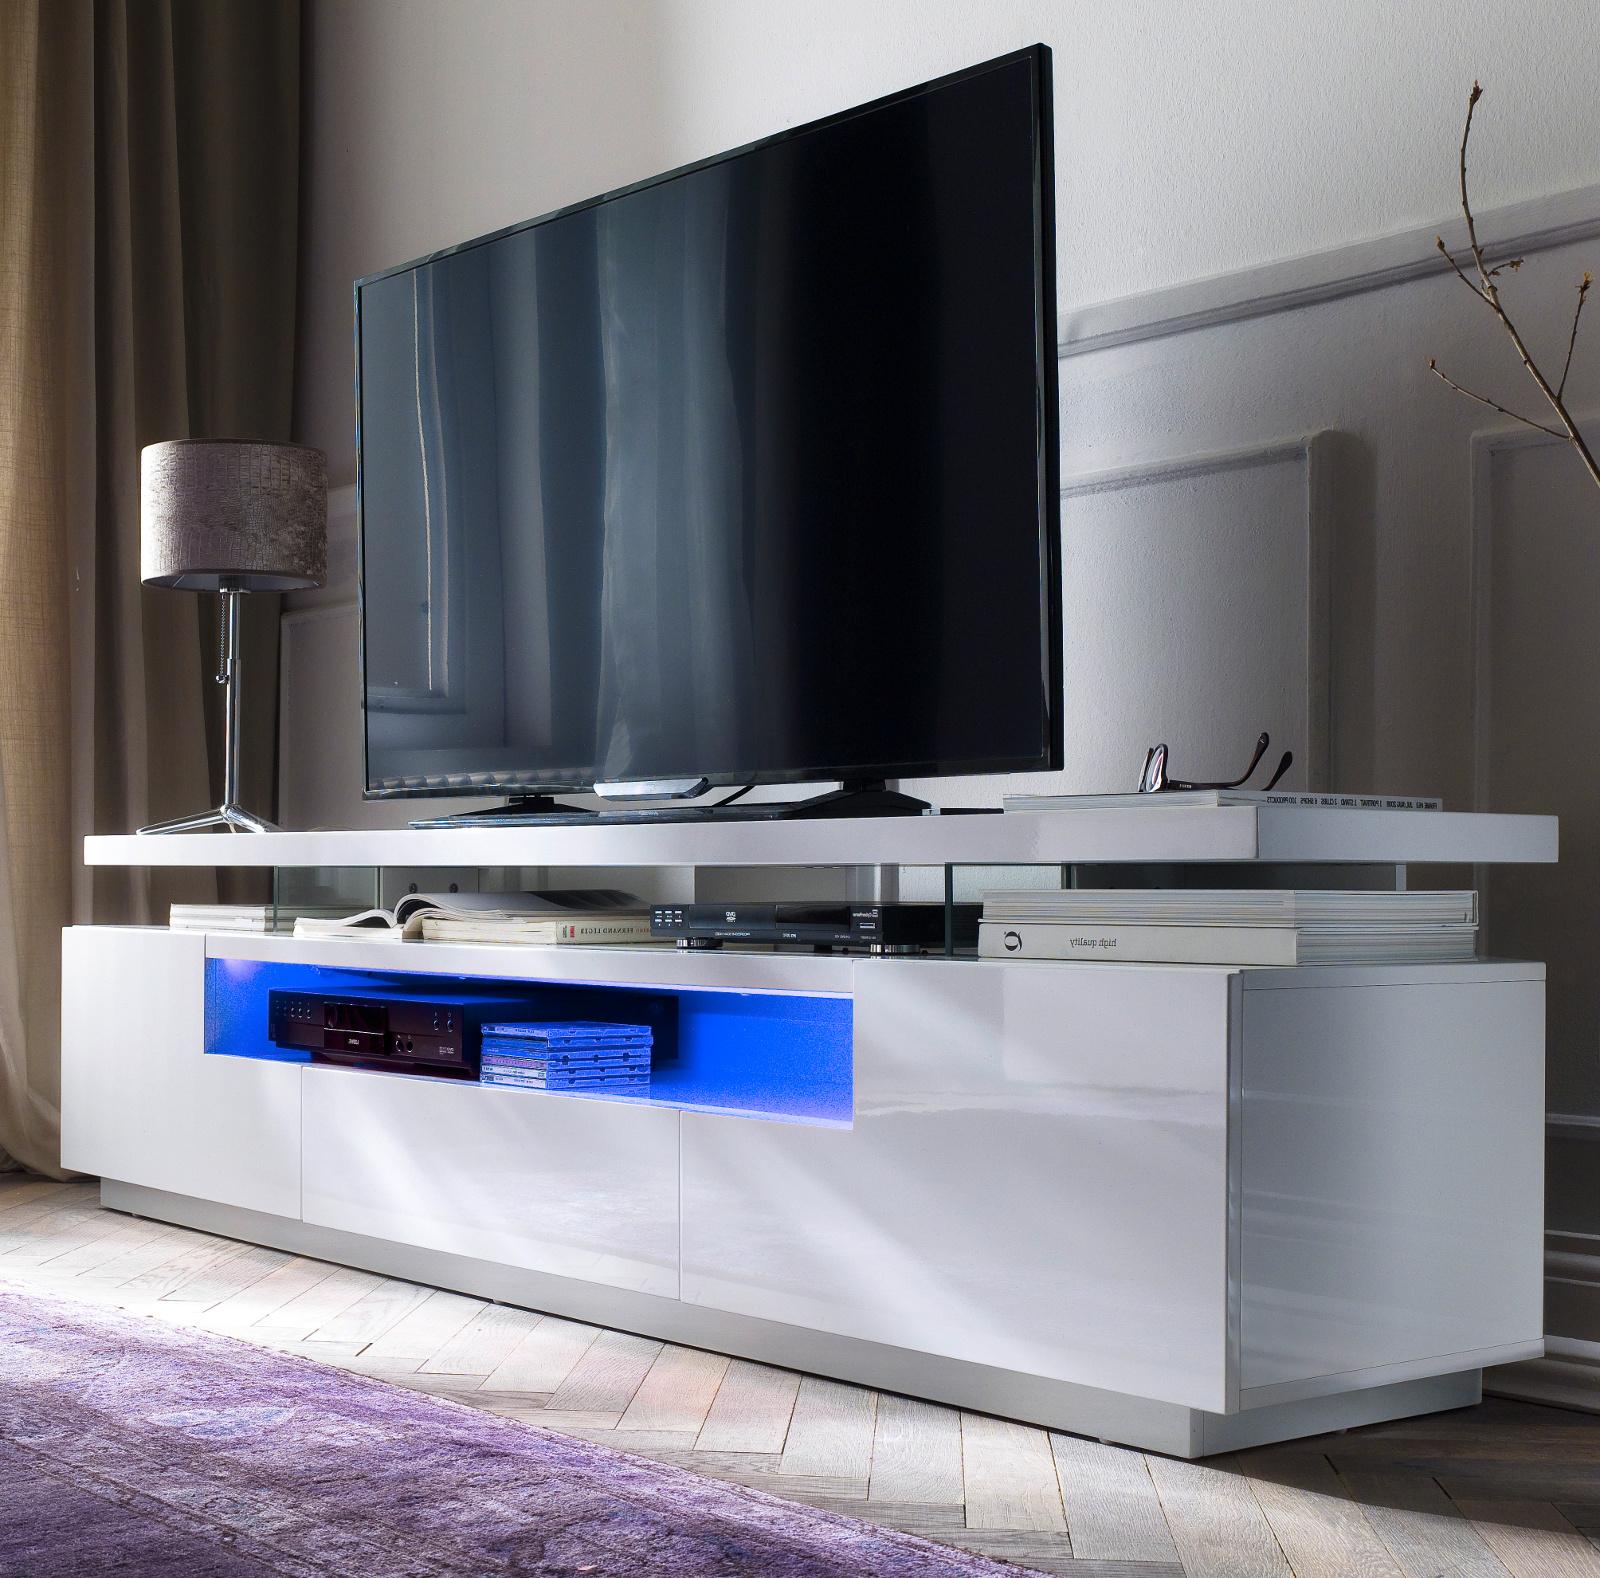 Tv Lowboard Evelina In Hochglanz Weiss Echt Lack Tv Unterteil Inkl Led Farbwechselbeleuchtung 200 X 51 Cm